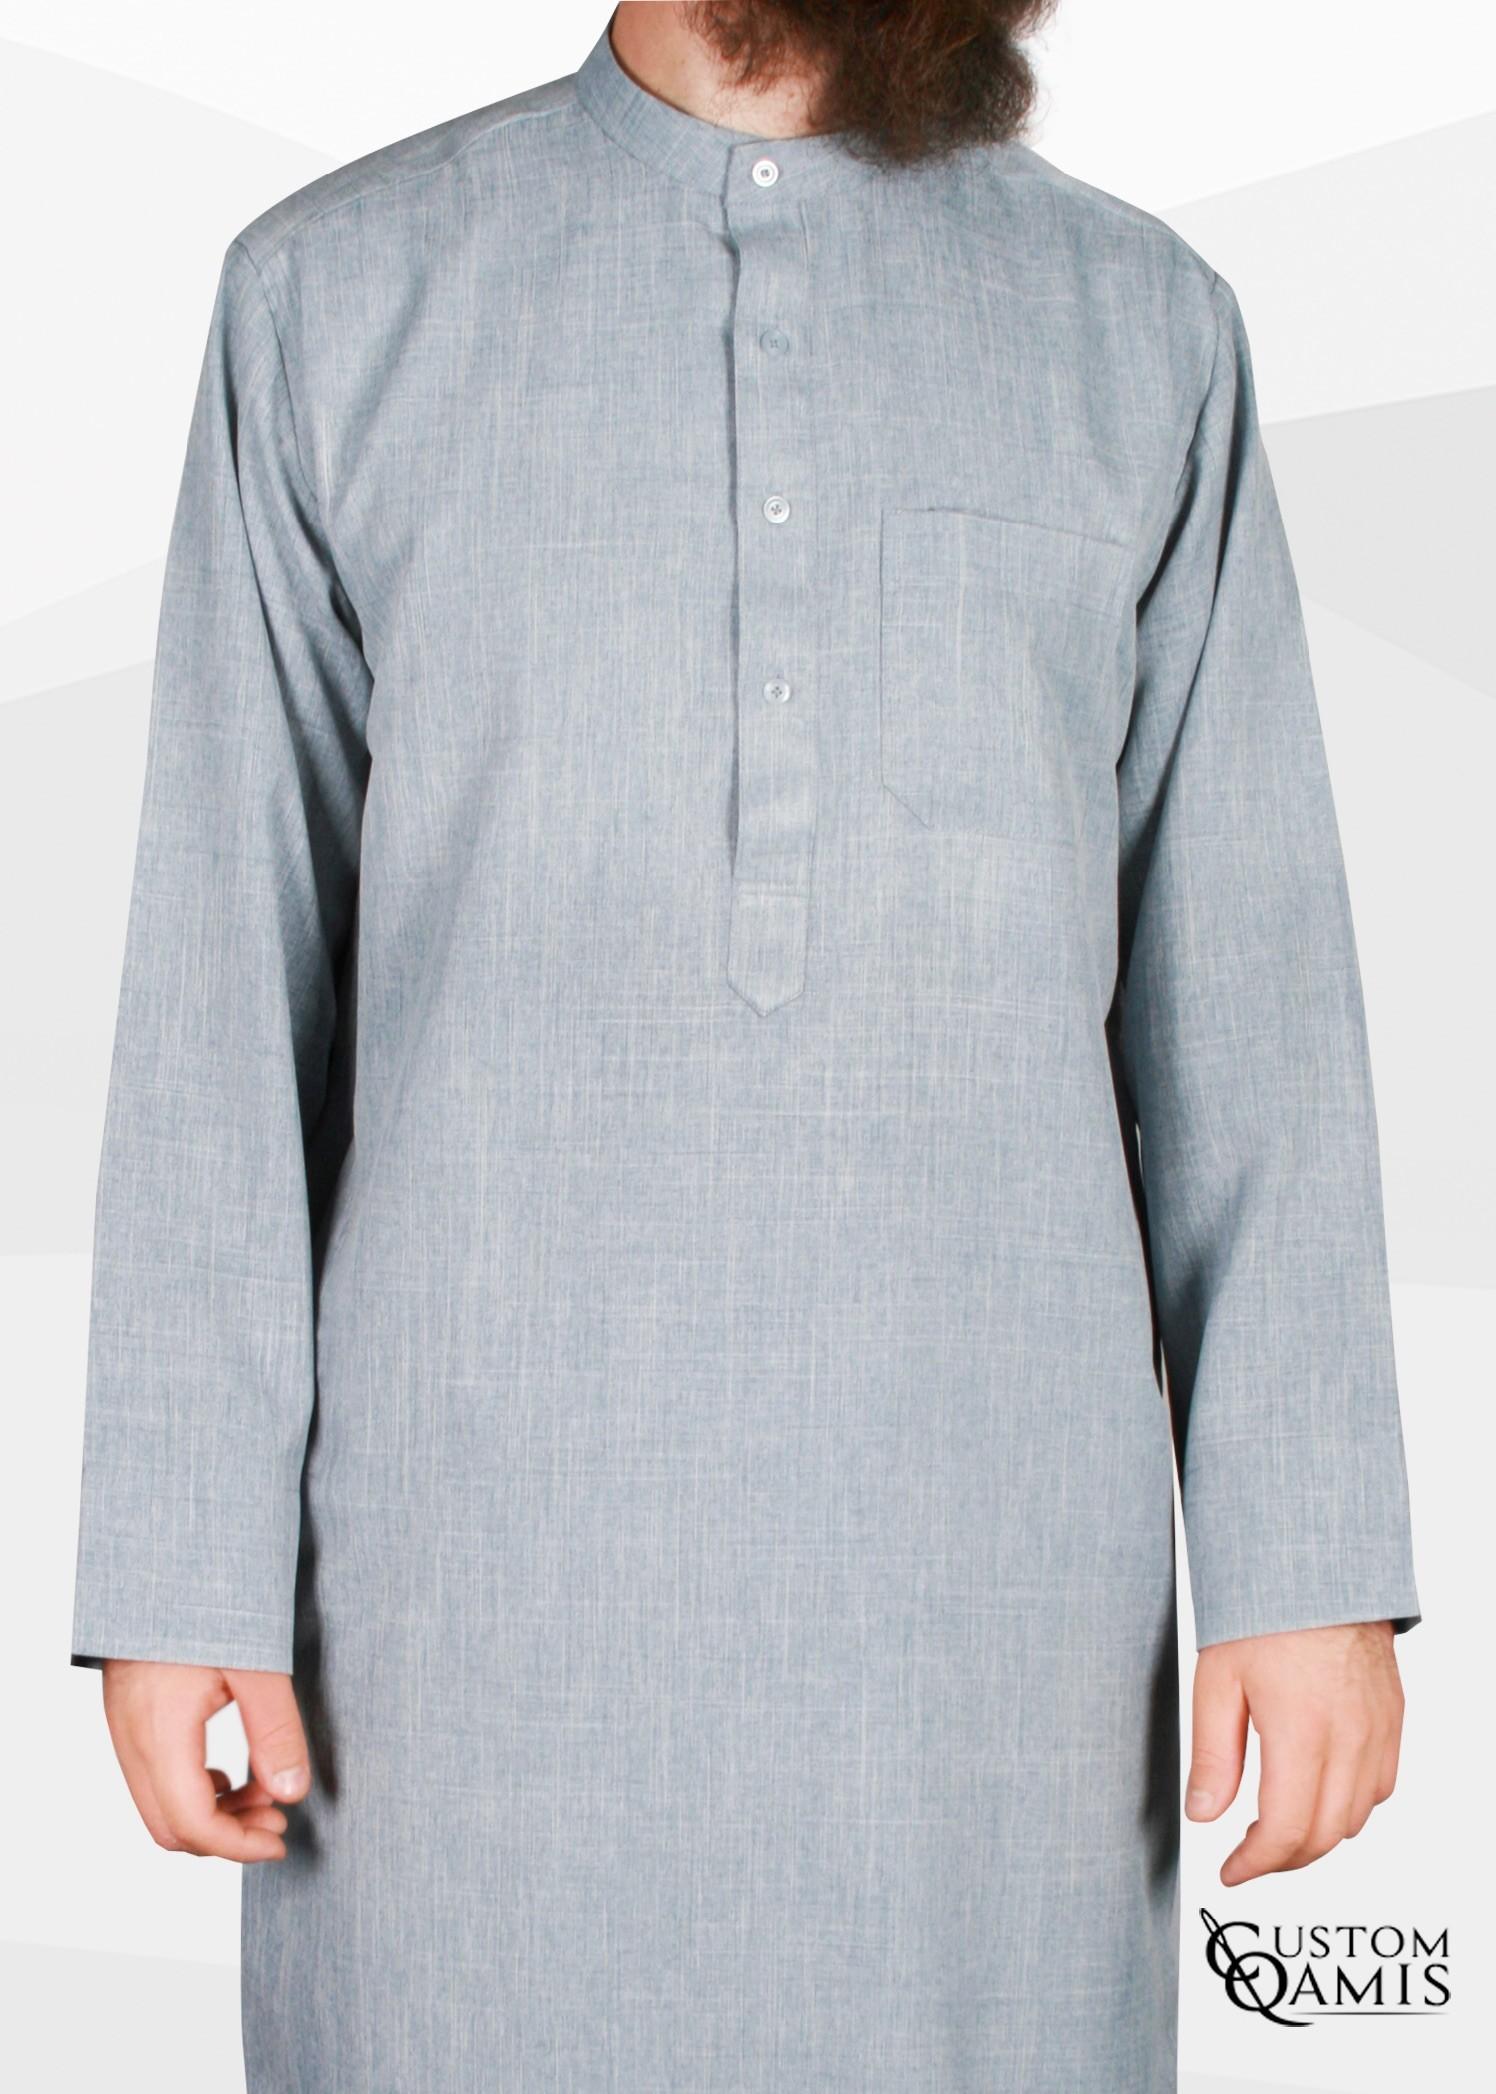 Koweti Thobe light bluish grey Imperial Fabric